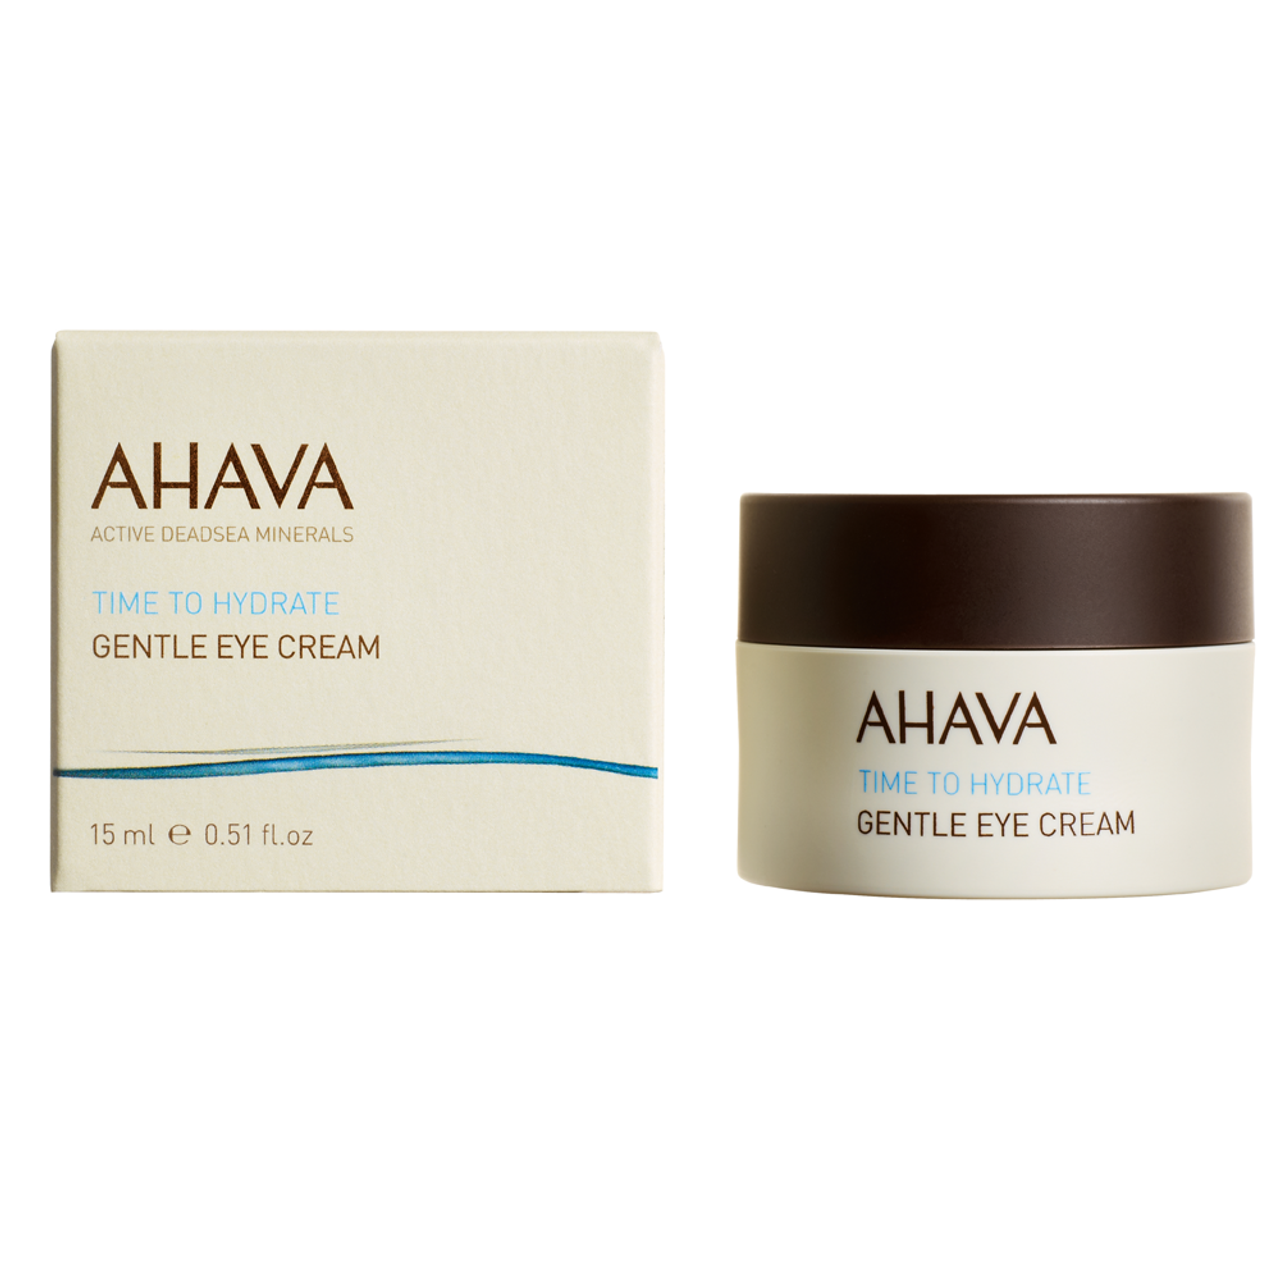 AHAVA Gentle Eye Cream BeautifiedYou.com